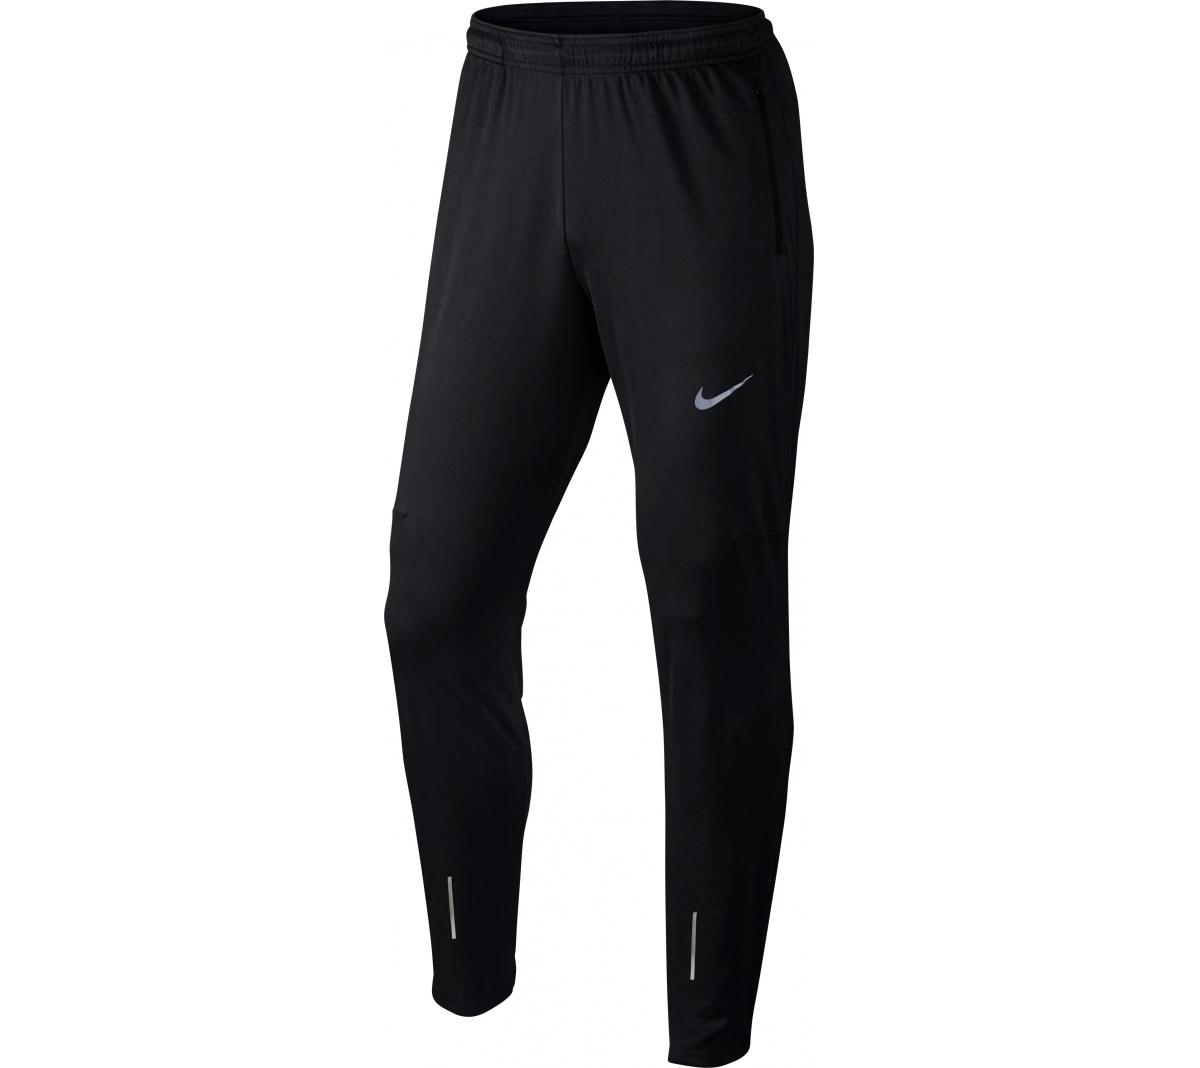 Calça Nike Racer Knit Track Pant